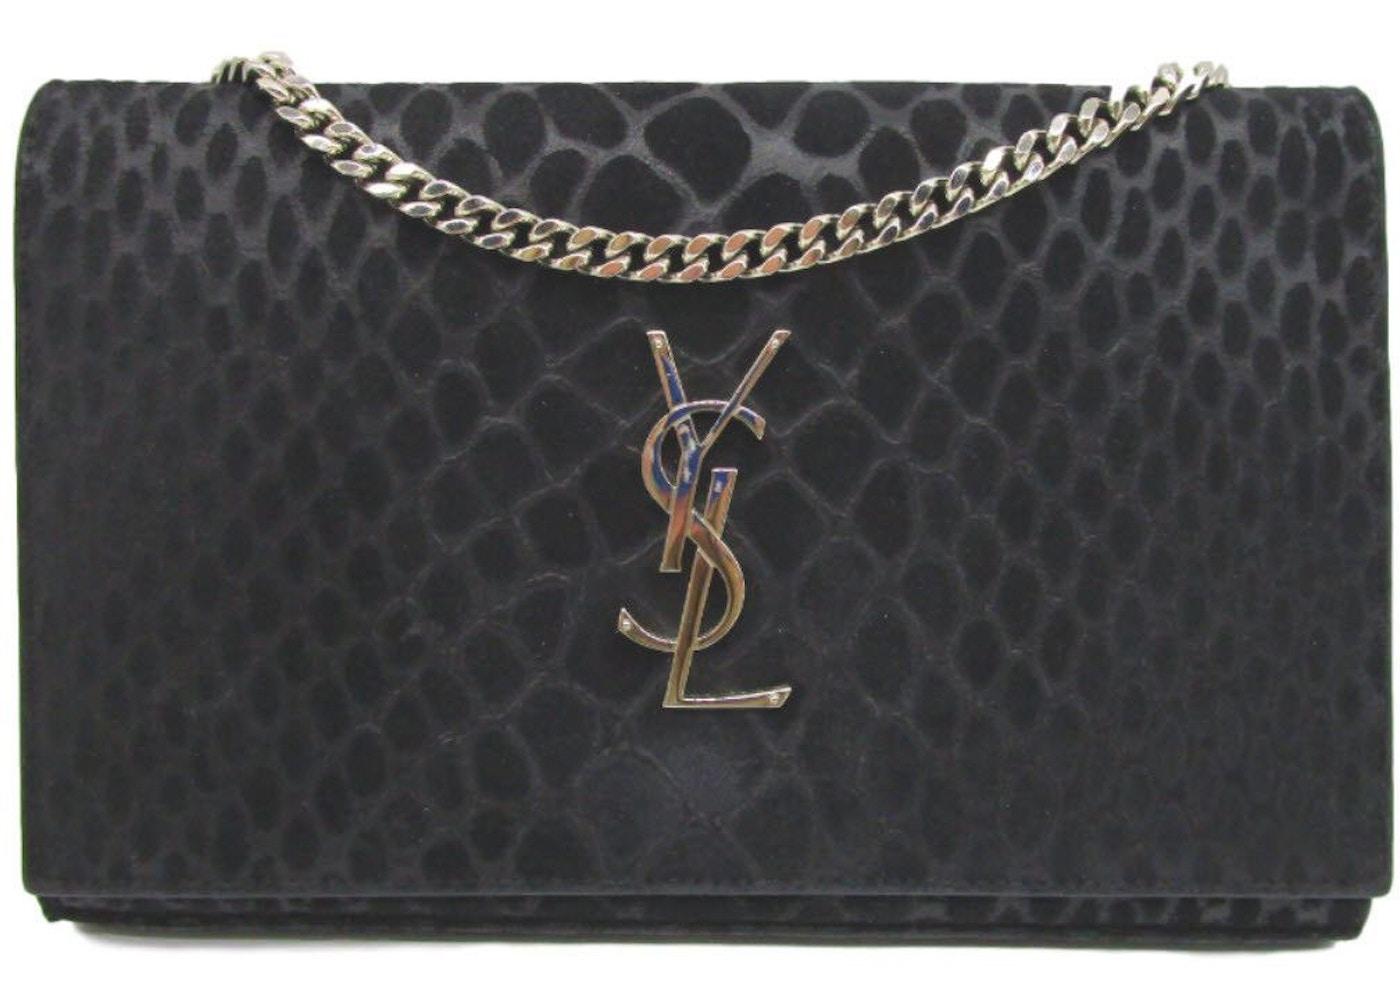 9e5bbb085f Saint Laurent Monogram Chain Wallet Suede Crocodile Medium Black